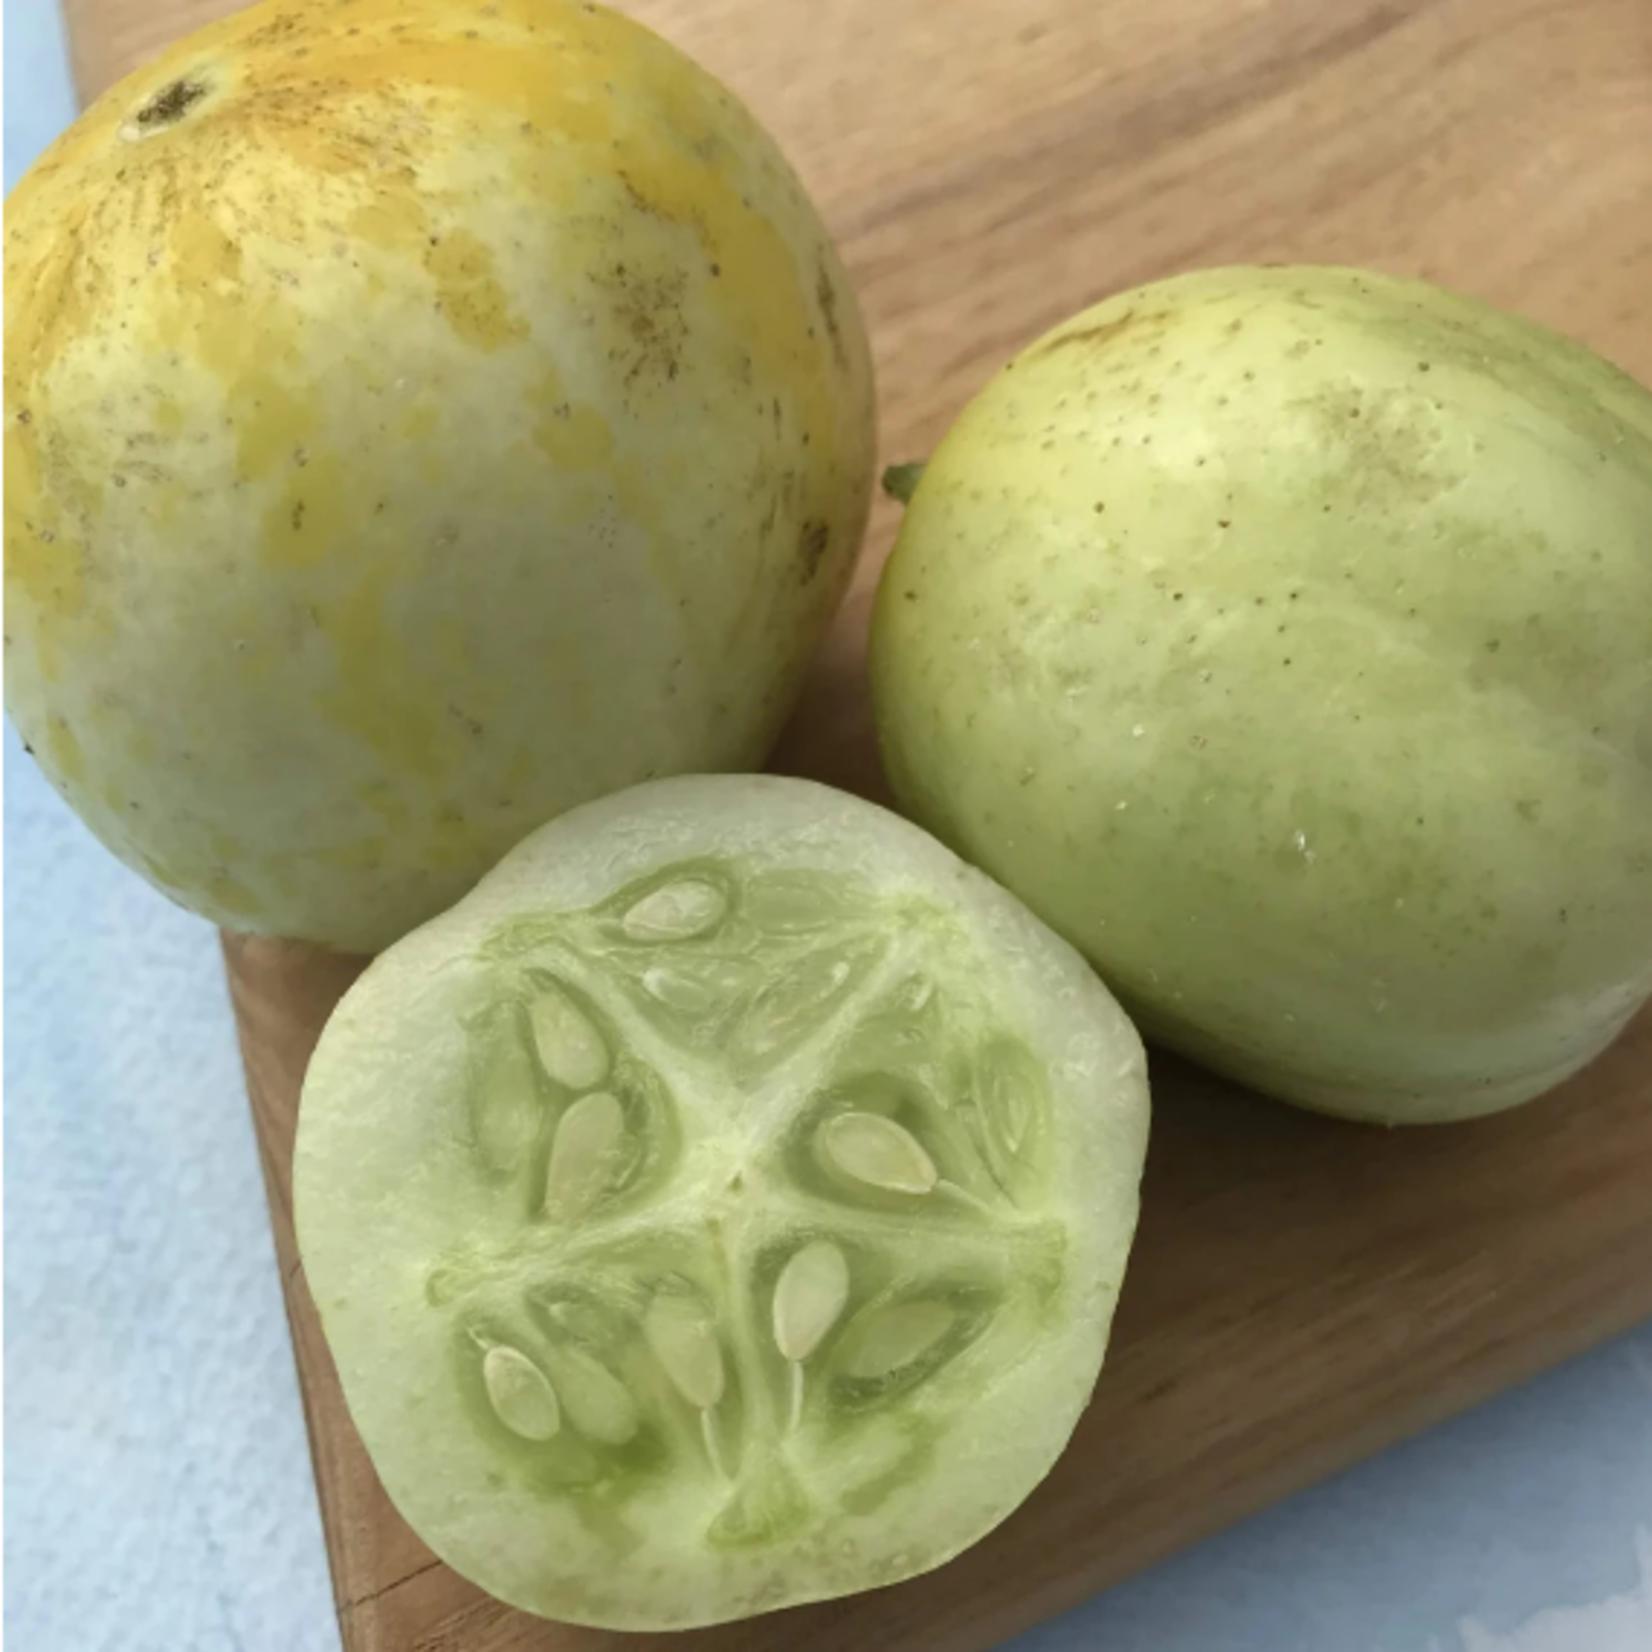 Hudson Valley Seeds Lemon Cucumber Seeds